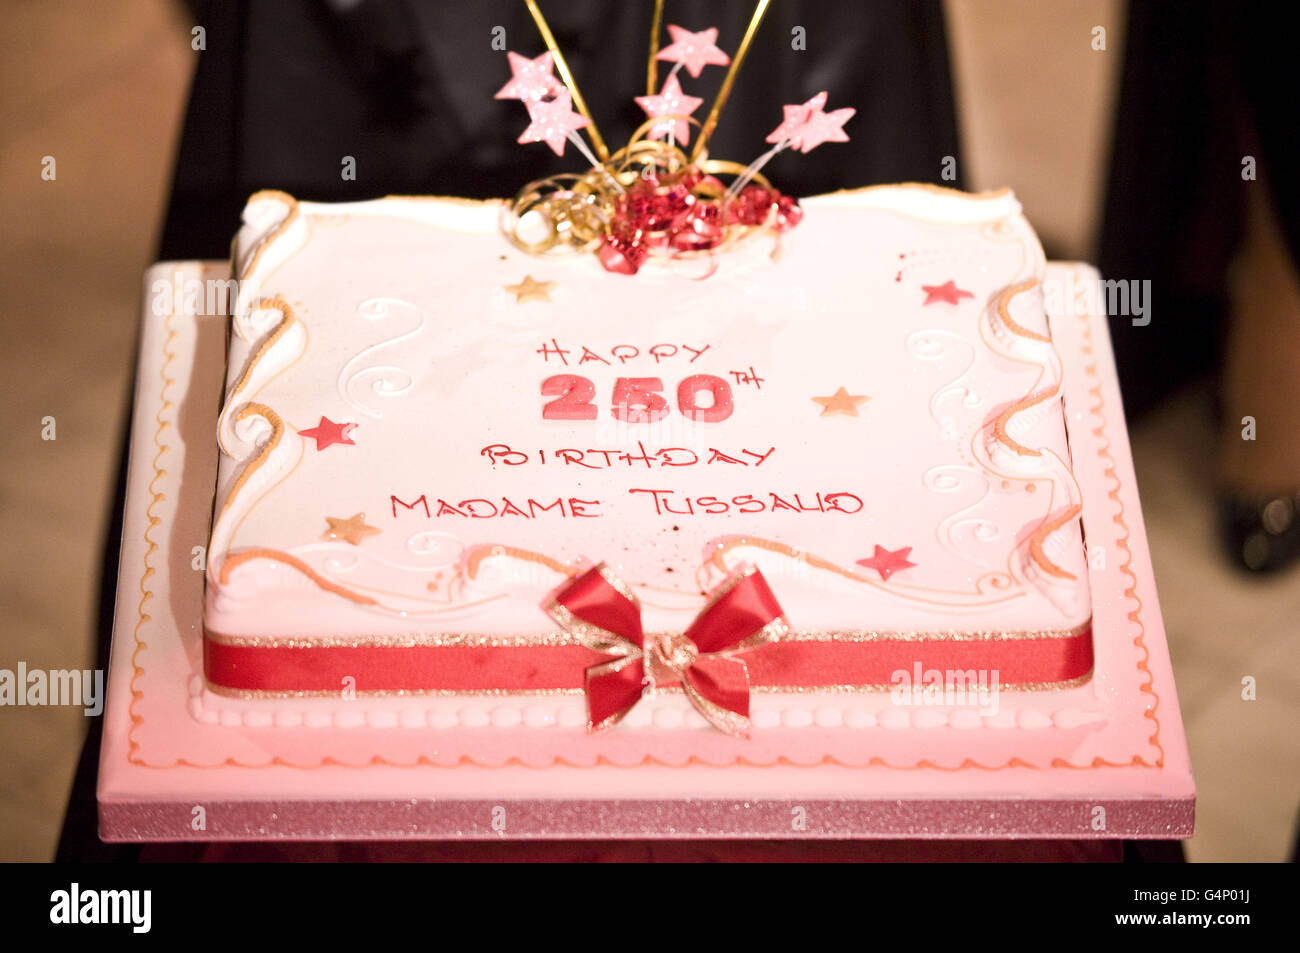 Madame Tussauds' 250th Anniversary - Stock Image